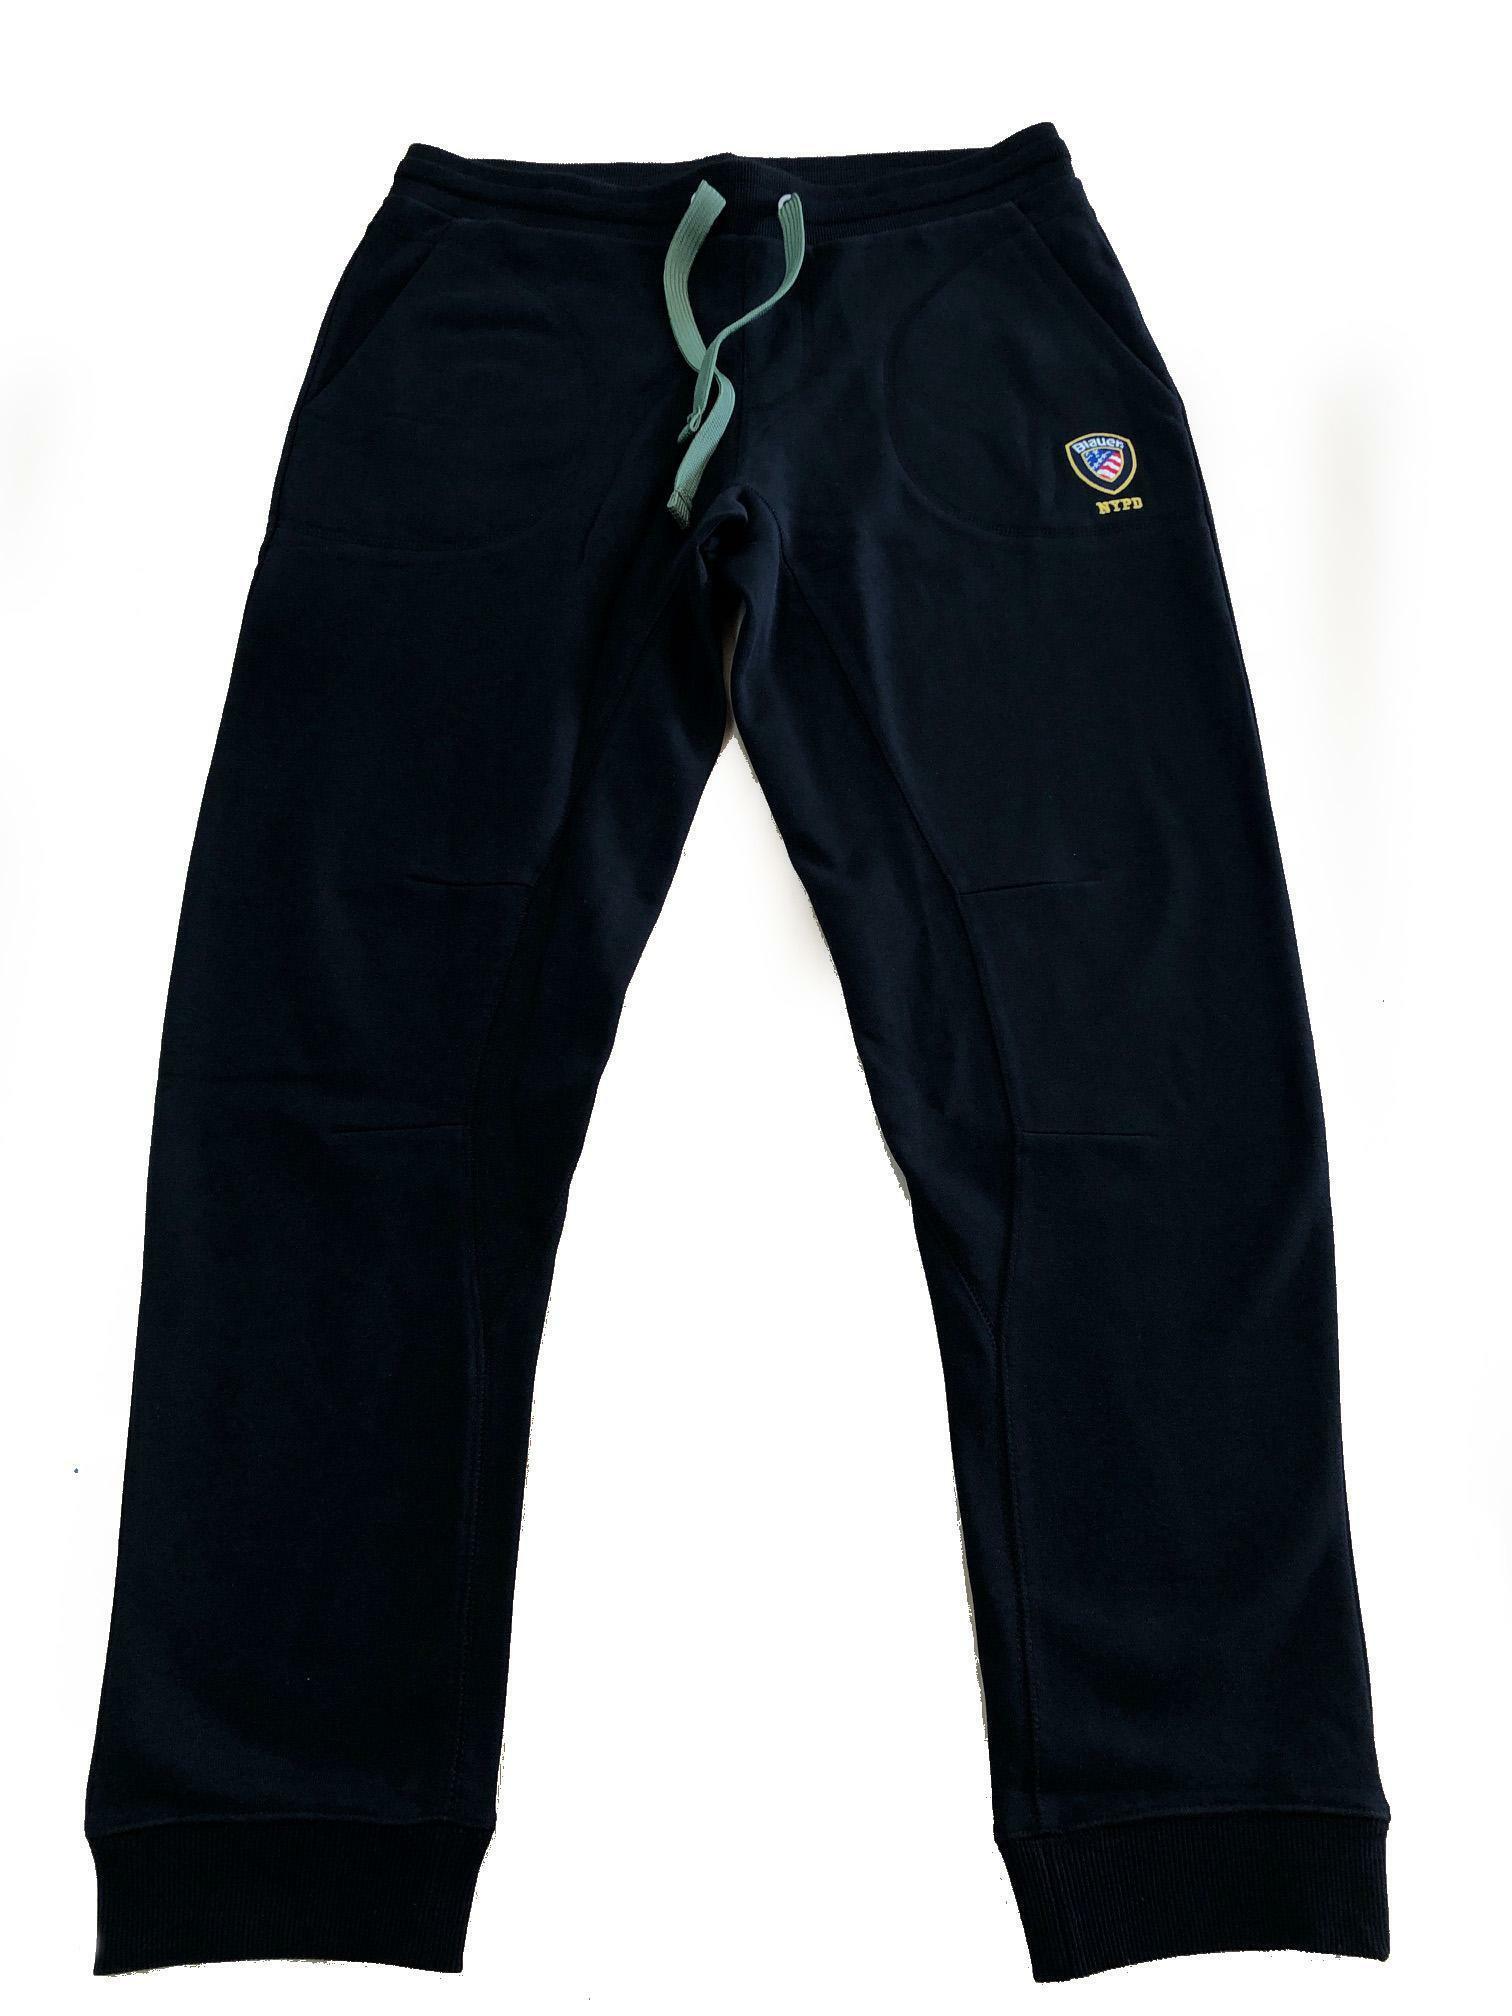 blauer pantalone tuta blauer uomo nero 20sbluf07139